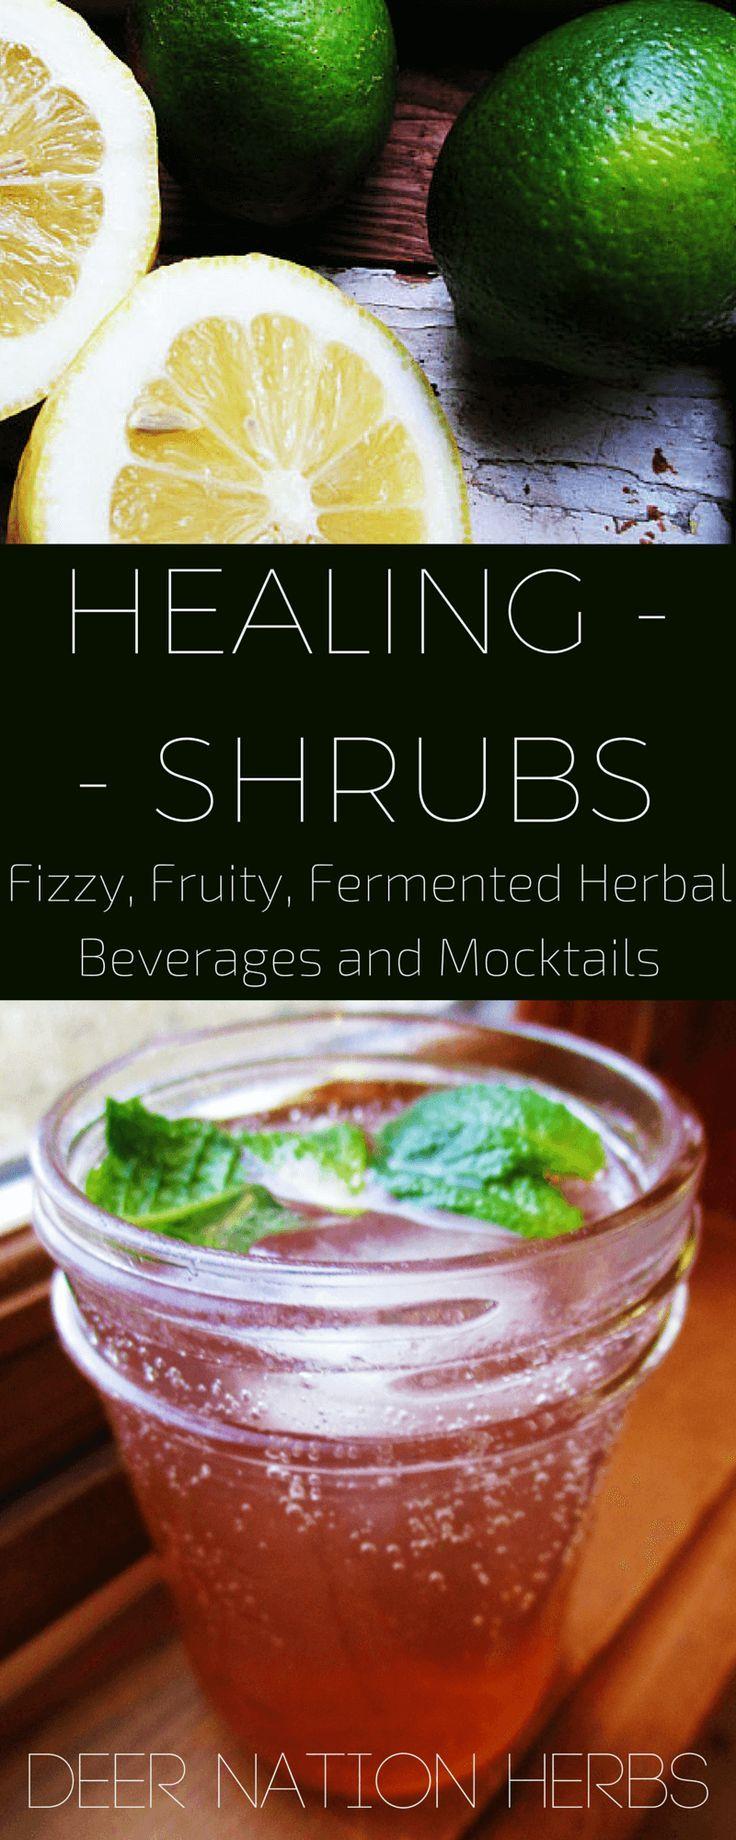 164 best fermented foods images on pinterest fermented for Ayurvedic healing cuisine